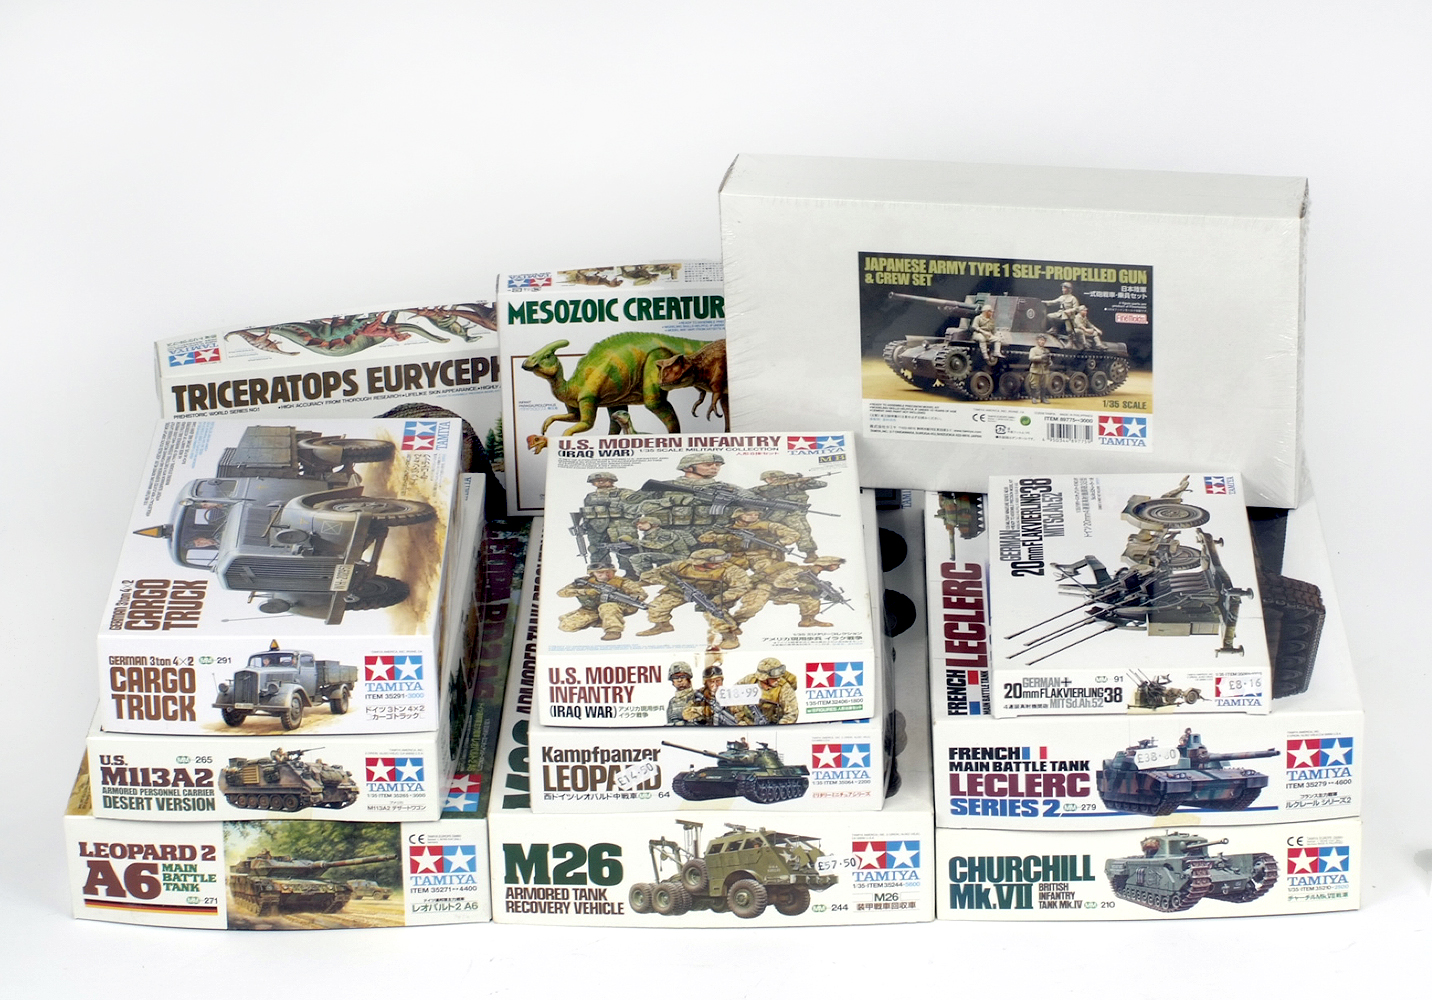 Lot 17 - 11 x Tamiya military plastic model kits, including: Cargo Truck; M26; etc.